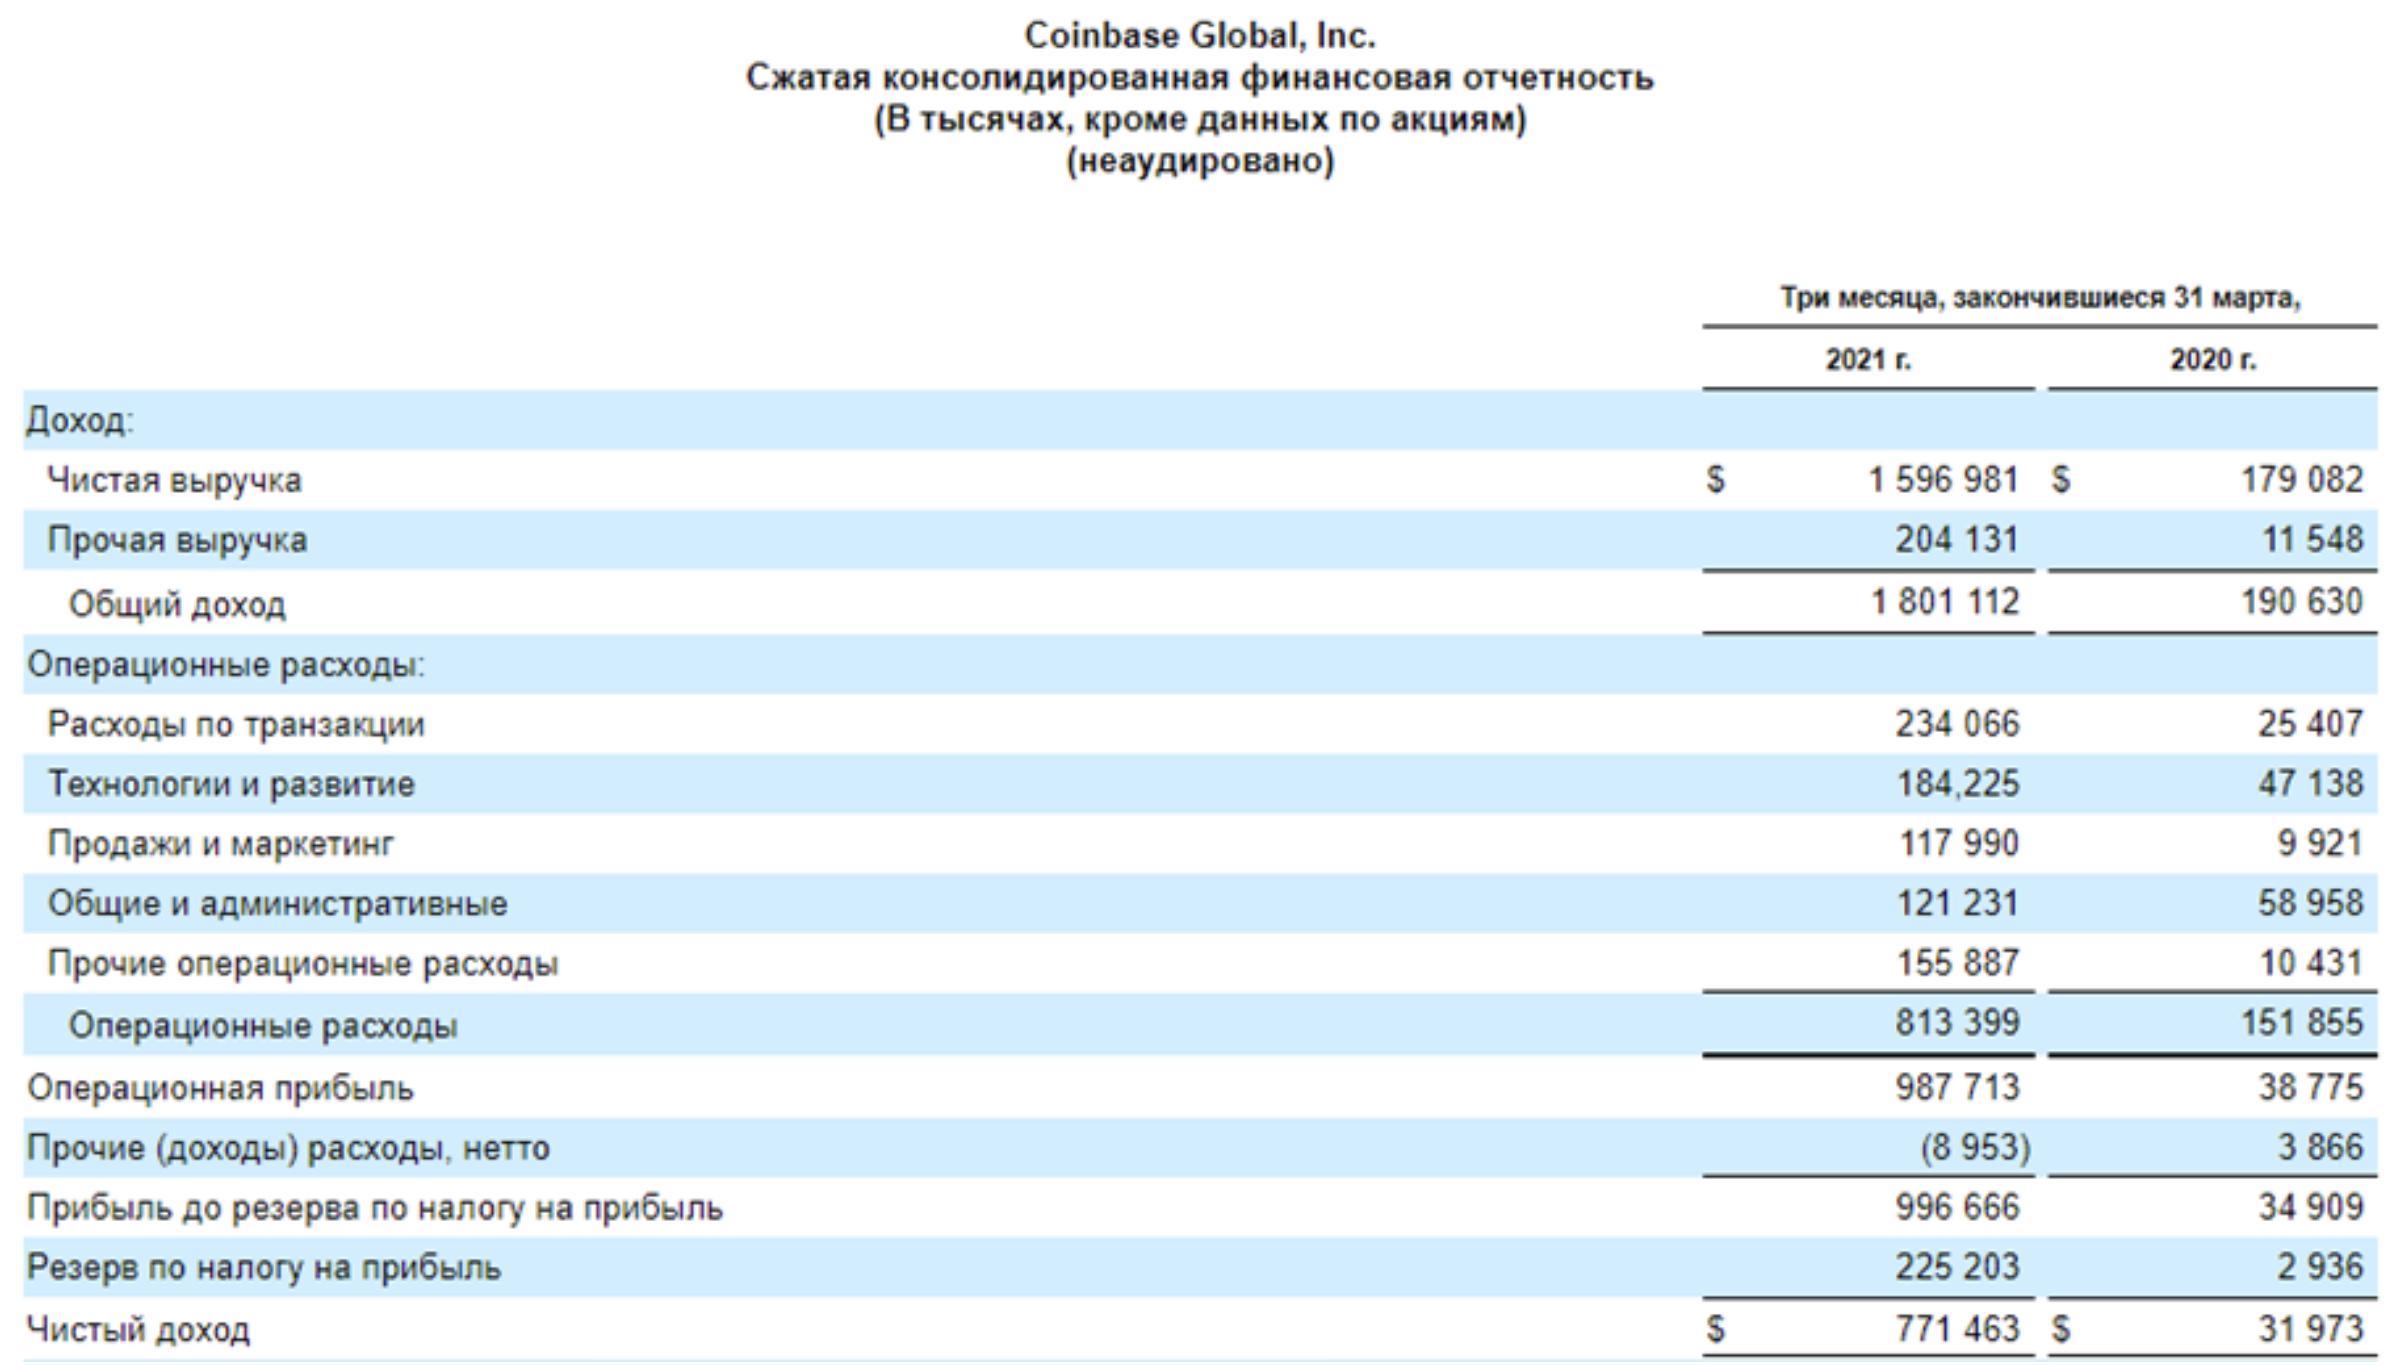 Coinbase - как биткоин, только лучше